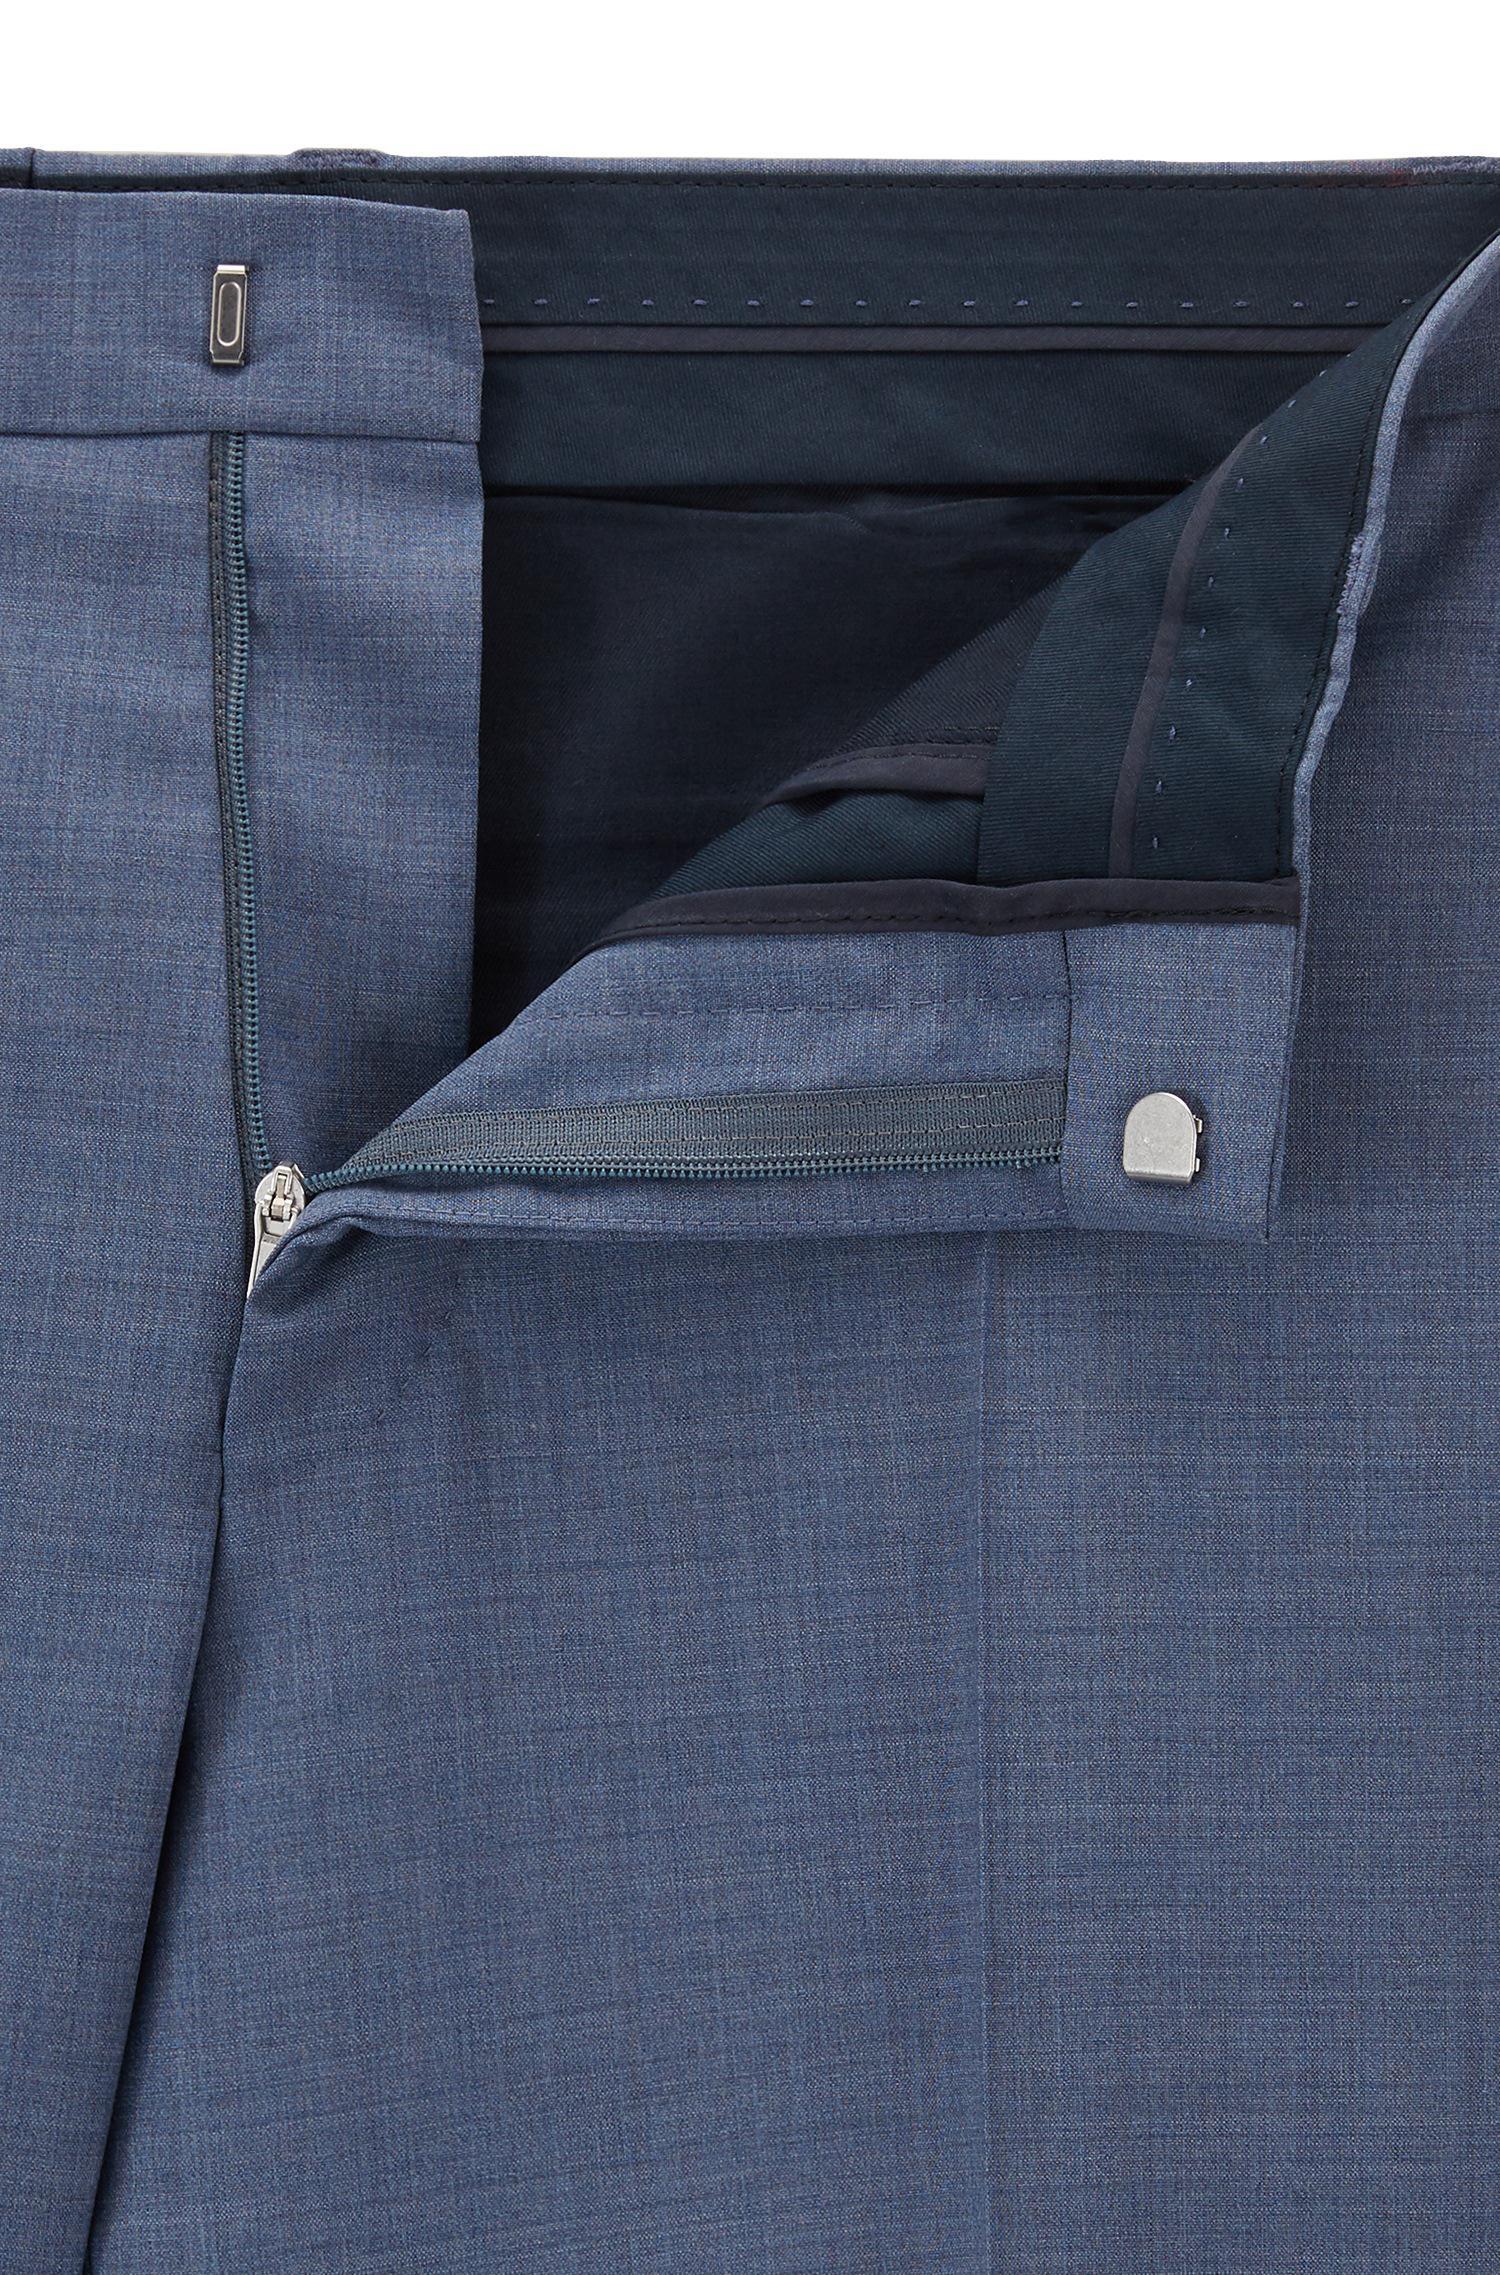 943daa4d BOSS Virgin Wool Suit, Regular Fit | Phoenix/madisen in Blue for Men ...